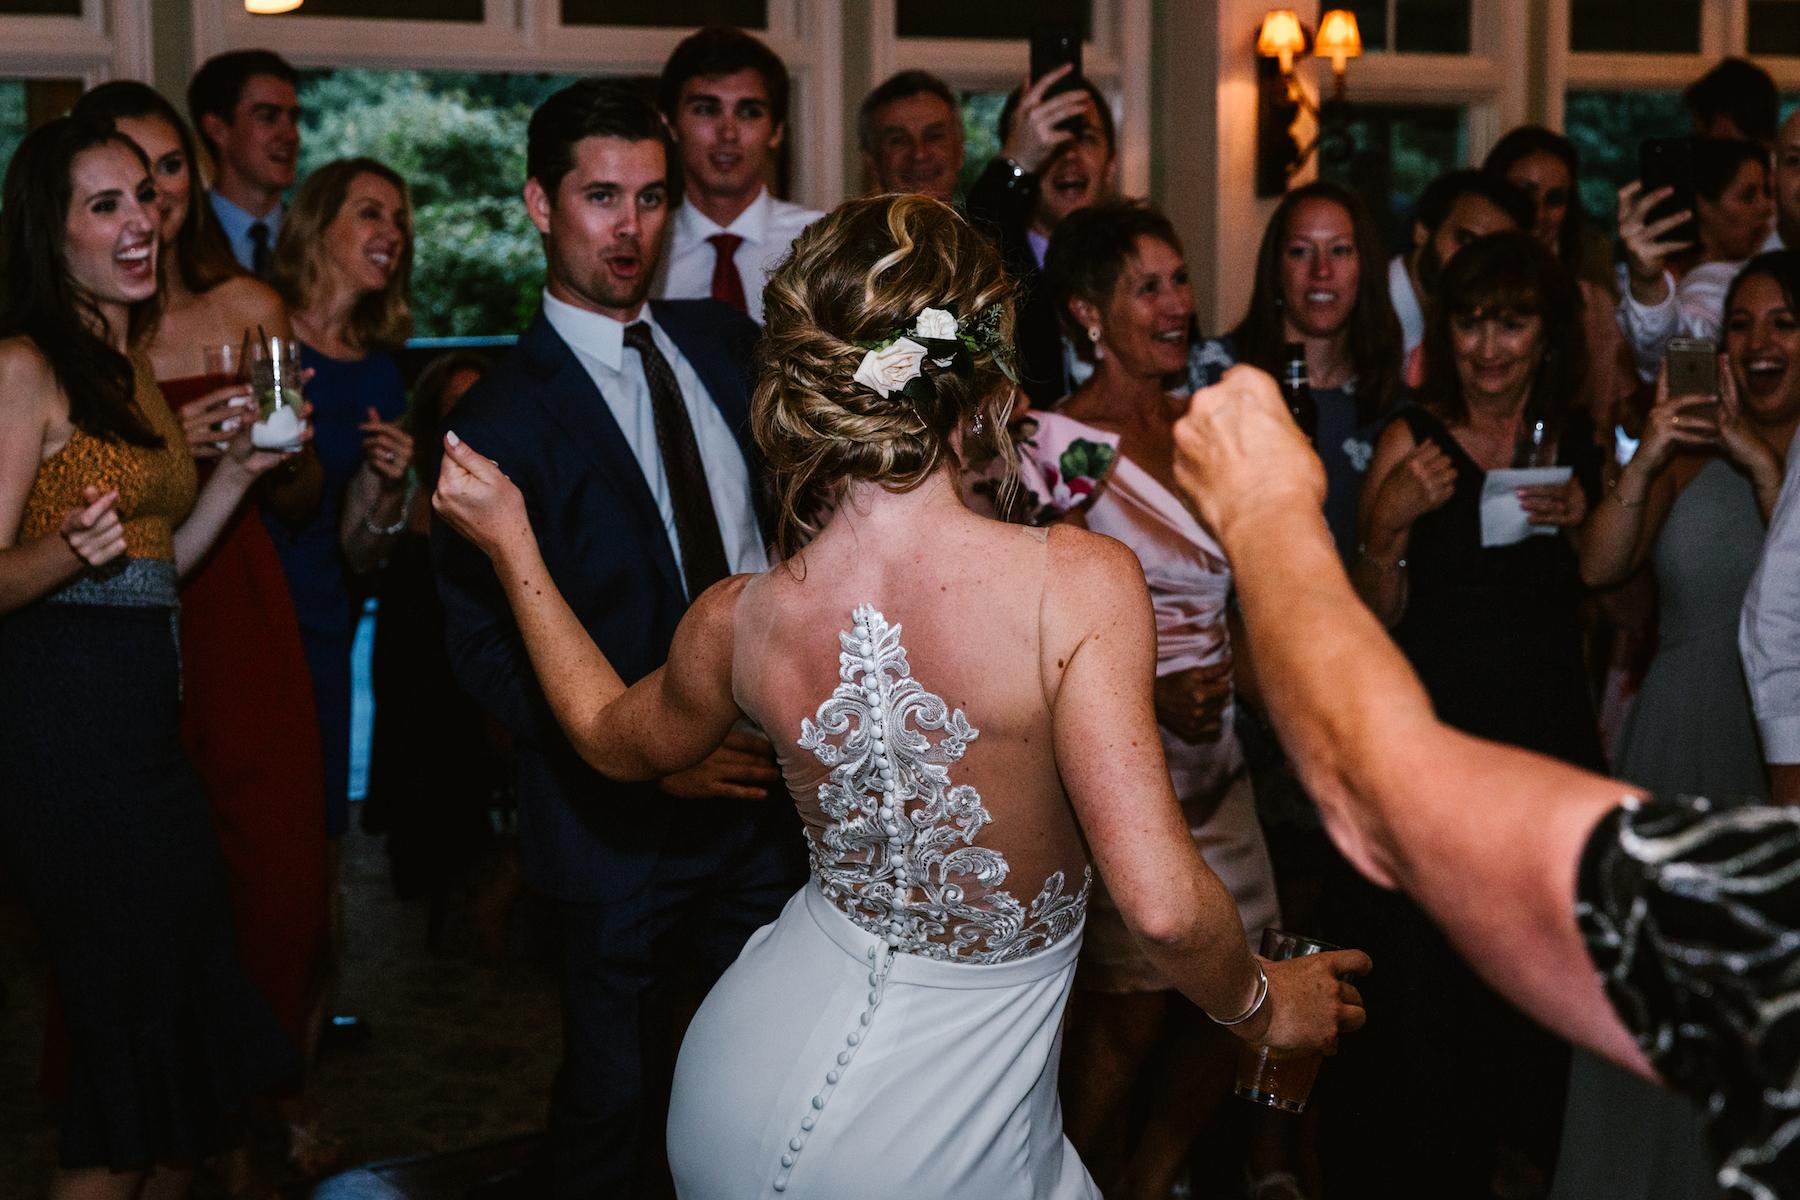 wedding-engagement-photographer-spartanburg-greenville-columbia-carolina-south-north-543.JPG